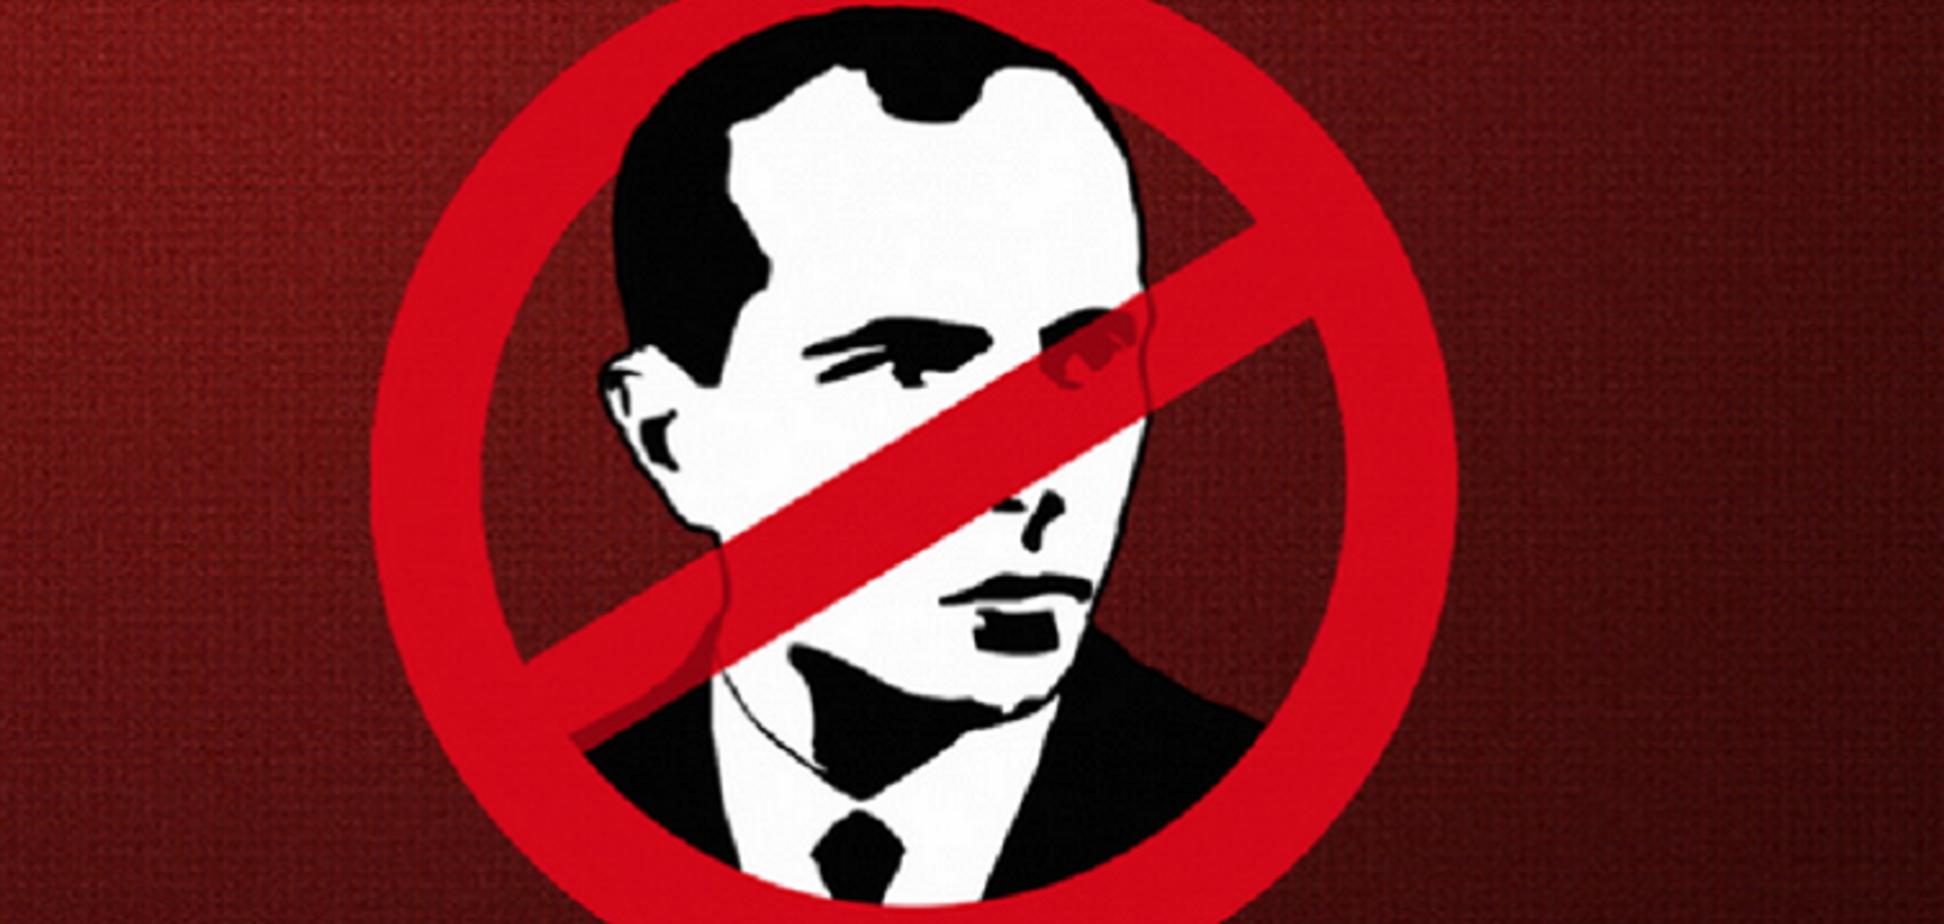 Ні 'бандеризму': Польща зробила черговий антиукраїнський випад